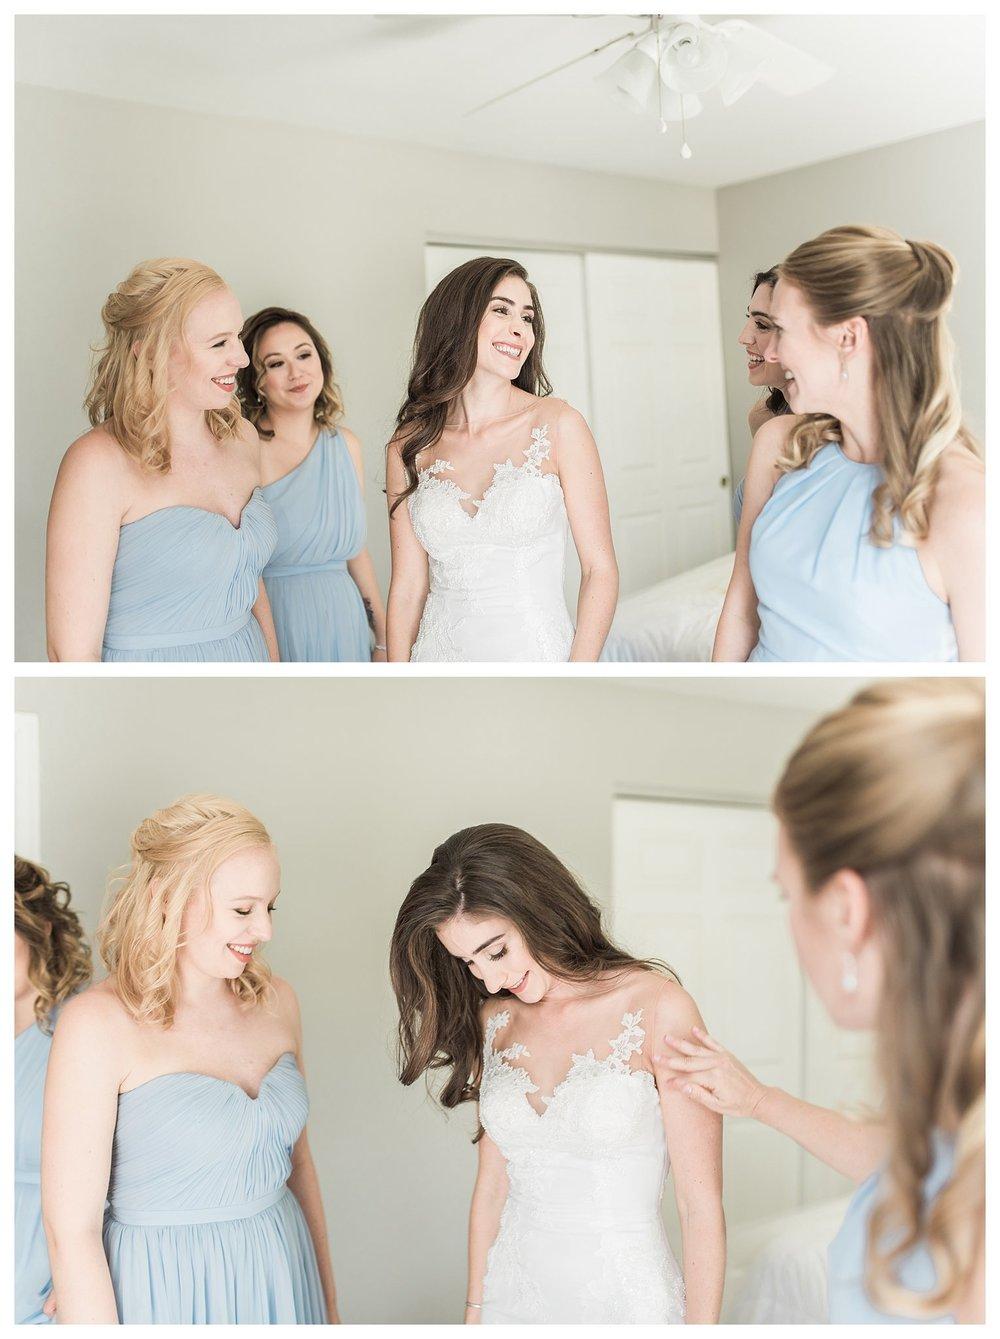 everleigh-photography-cincinnati-wedding-photographer-the-backstage-event-center-adamandlauren-12